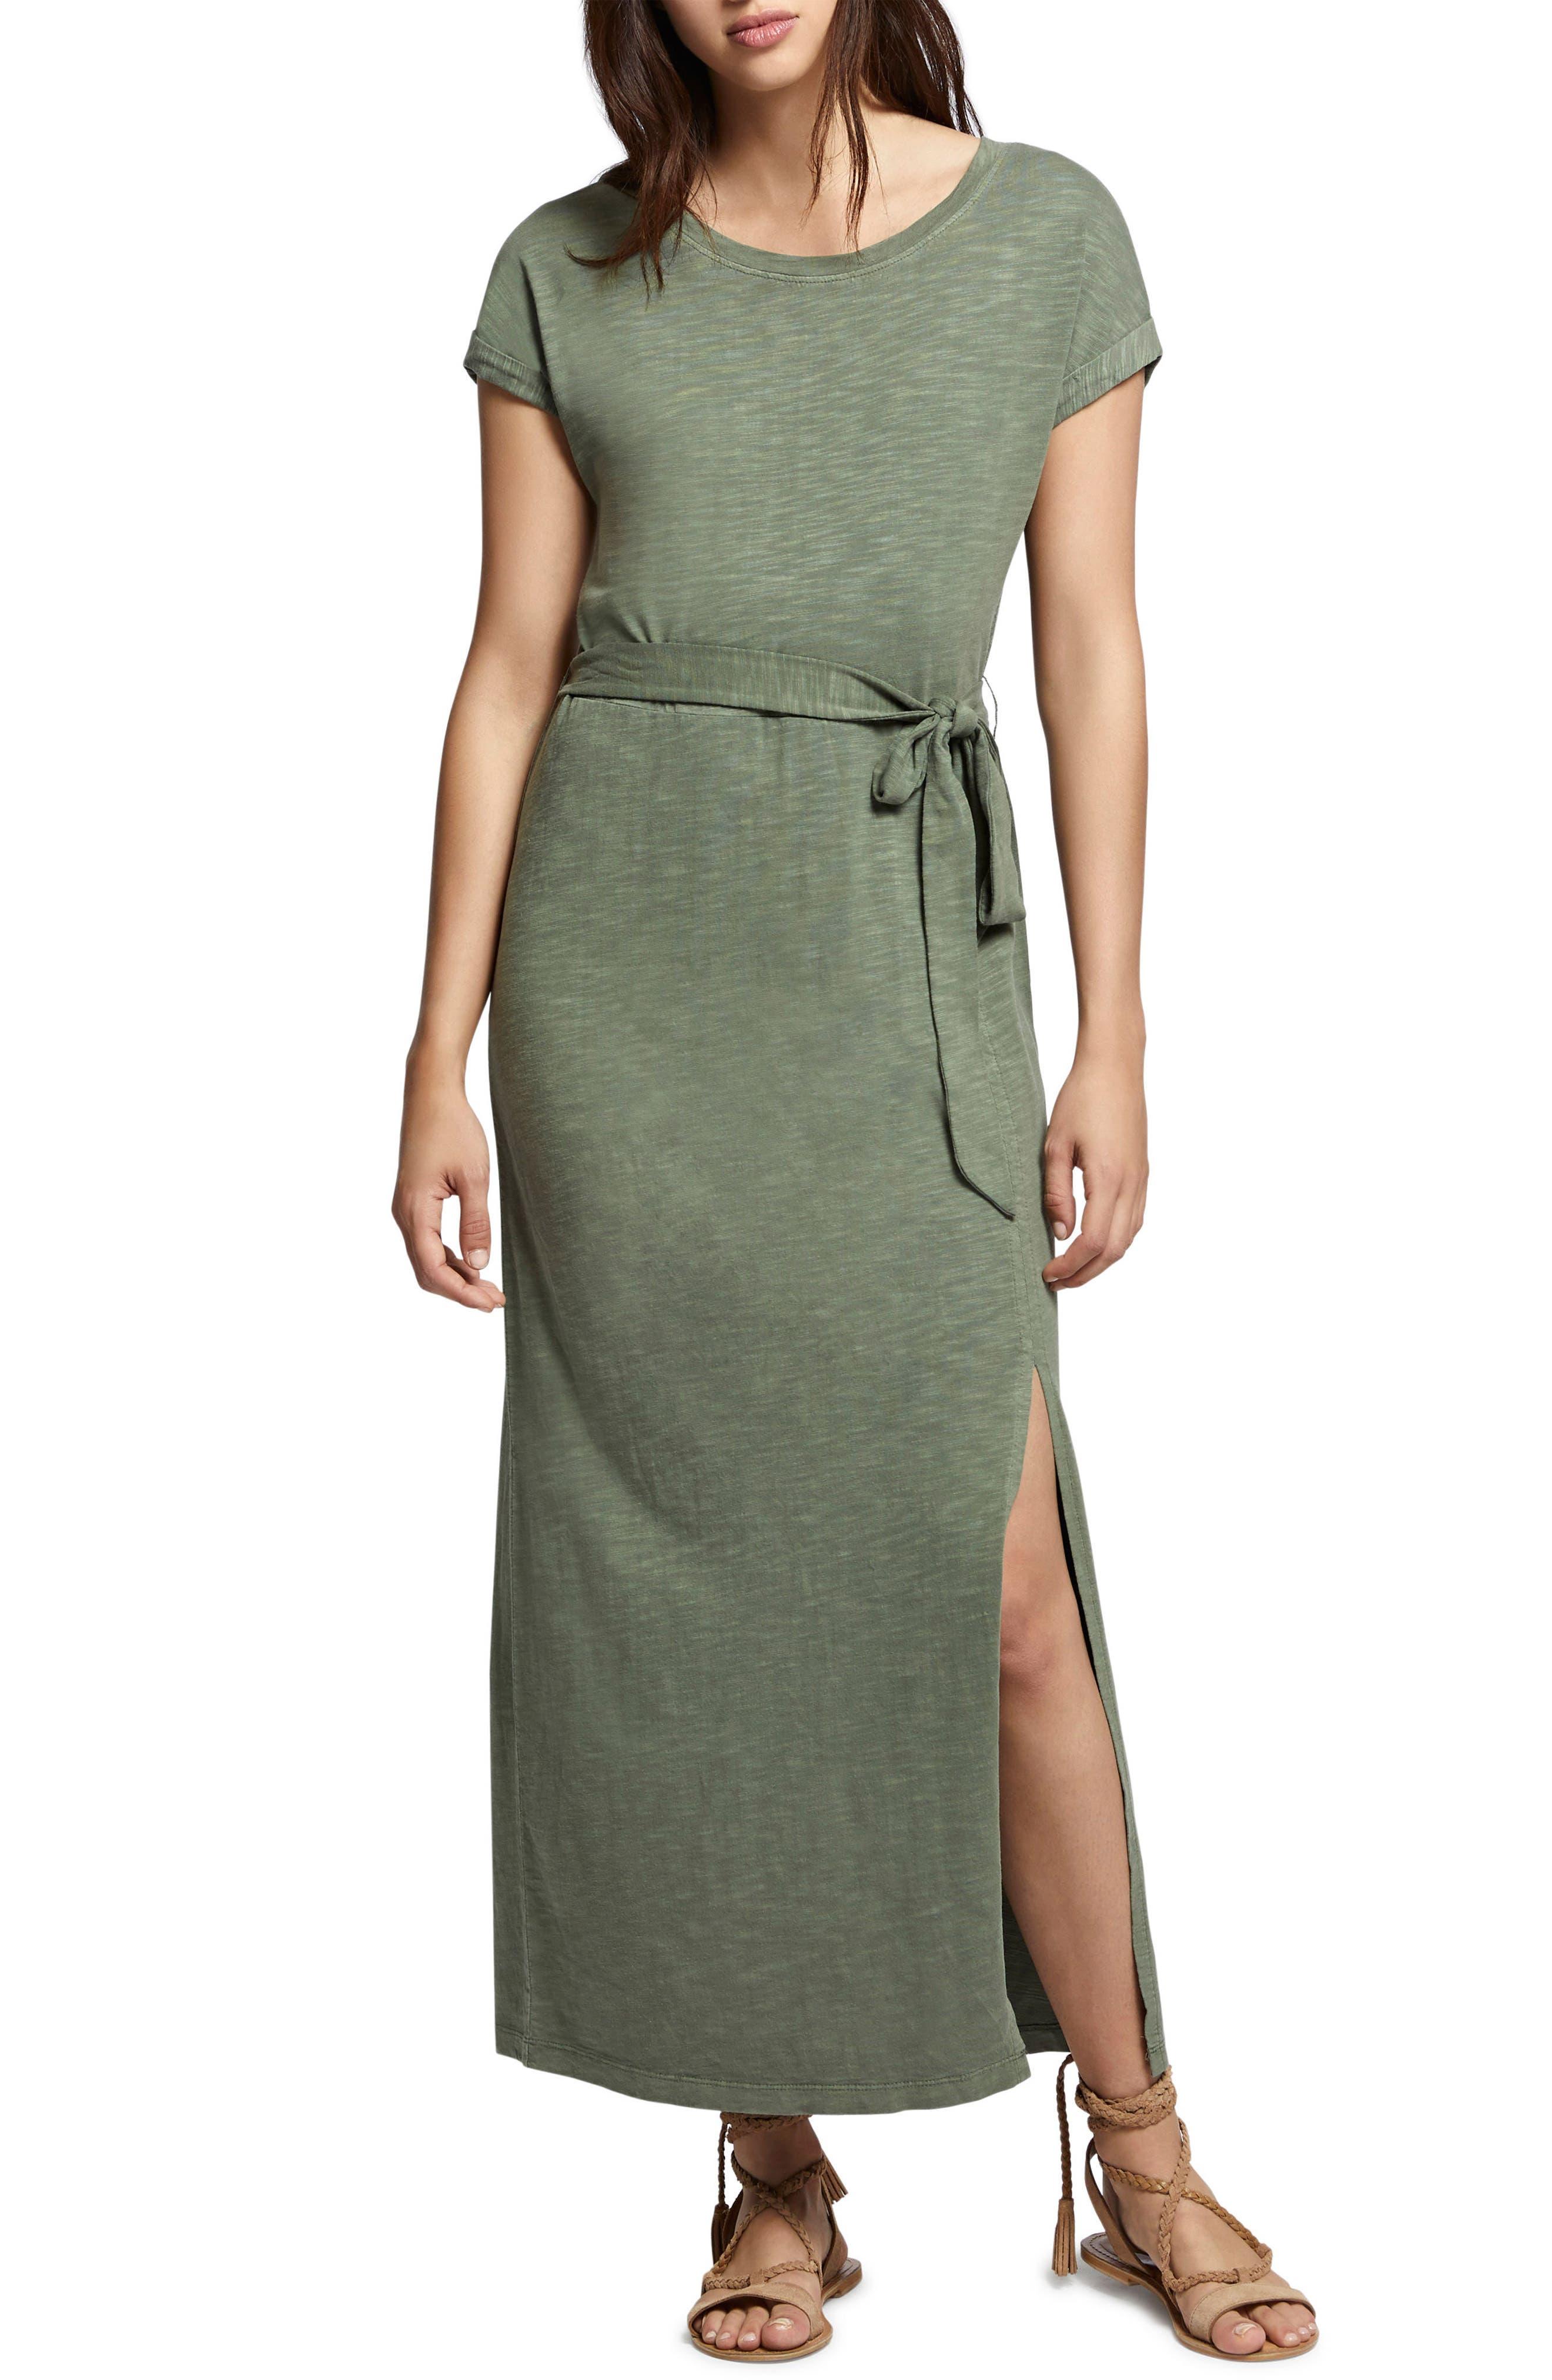 Isle Maxi Dress,                             Main thumbnail 1, color,                             Cadet